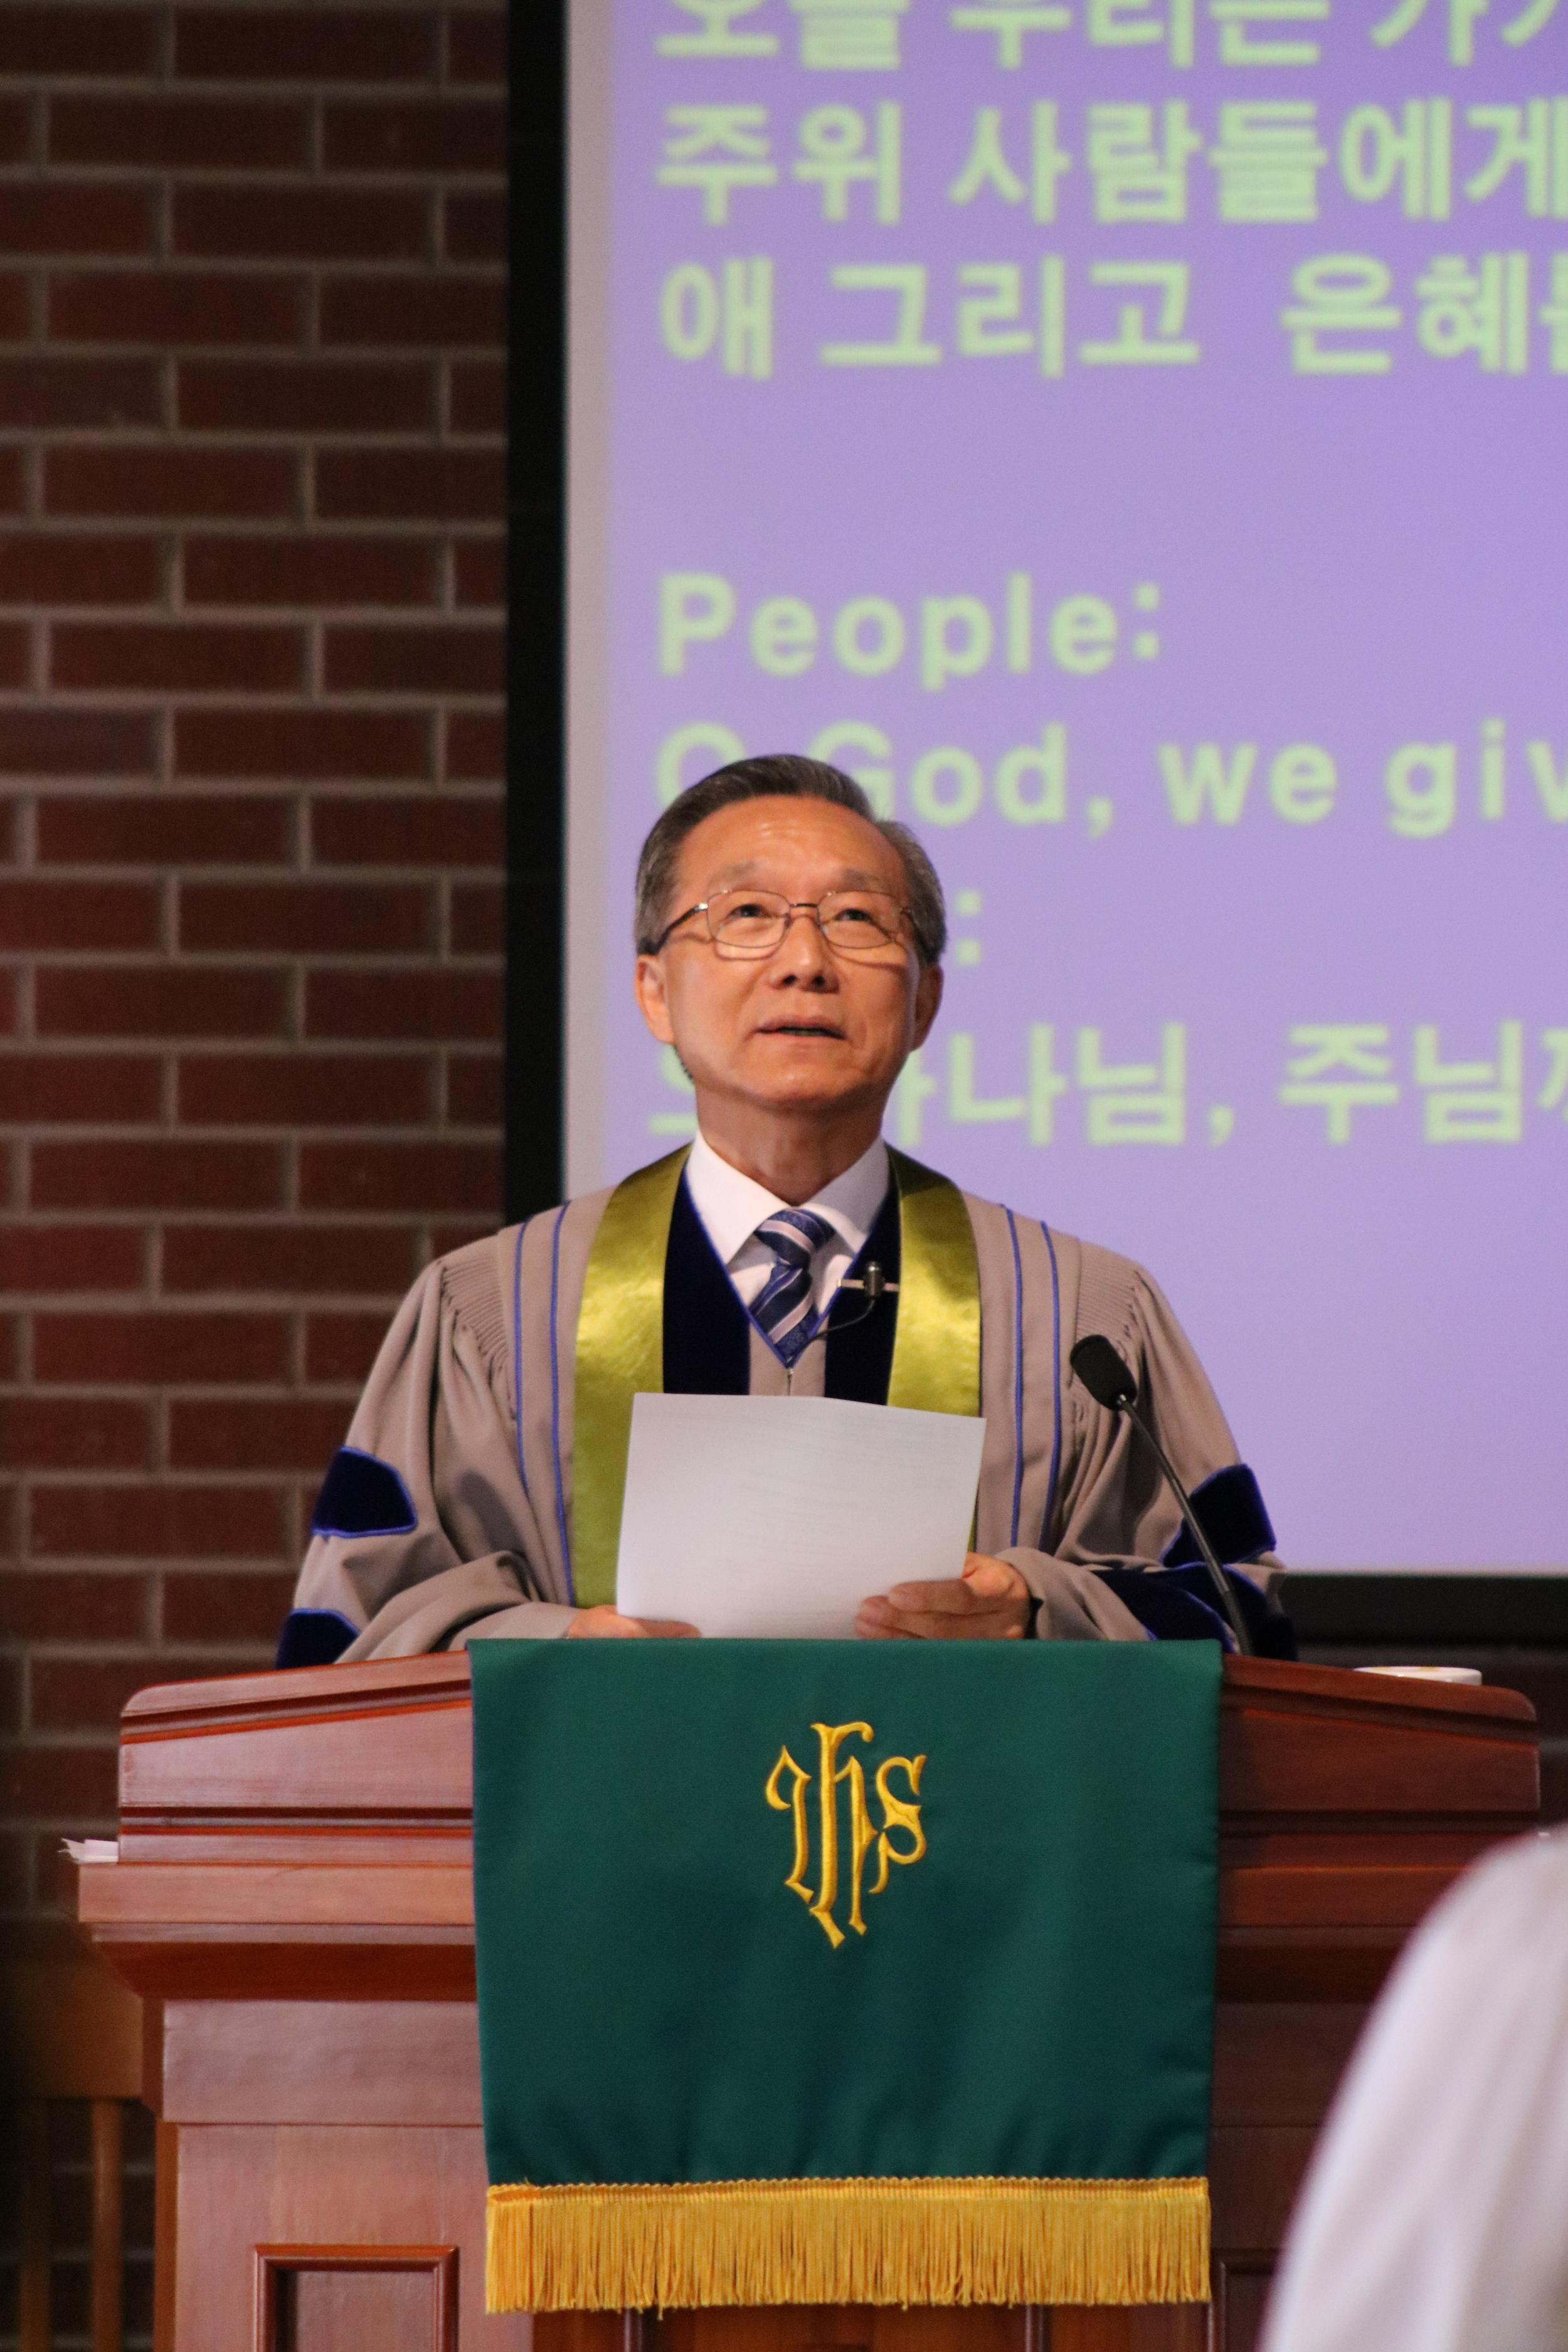 Rev. Dr. Geunhee Yu